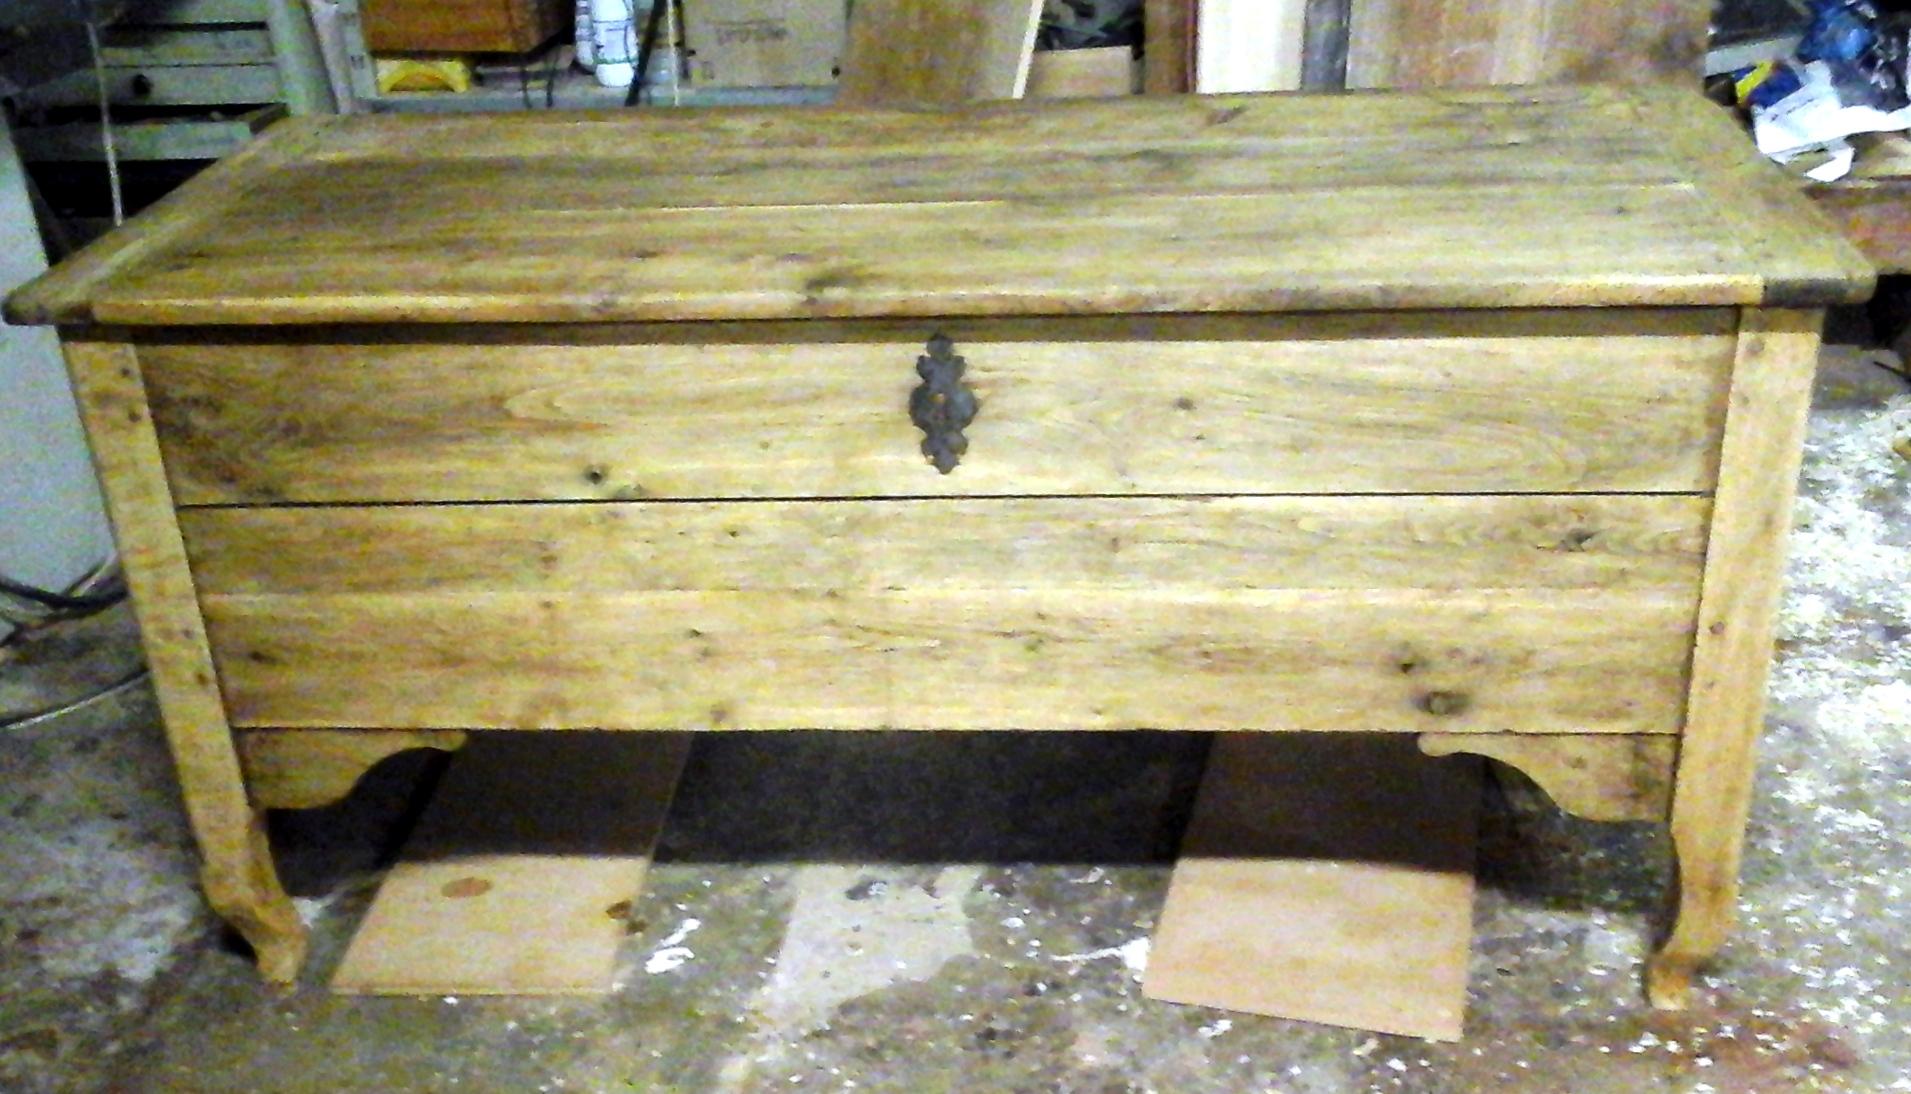 restauration de meubles anciens martin pesme. Black Bedroom Furniture Sets. Home Design Ideas